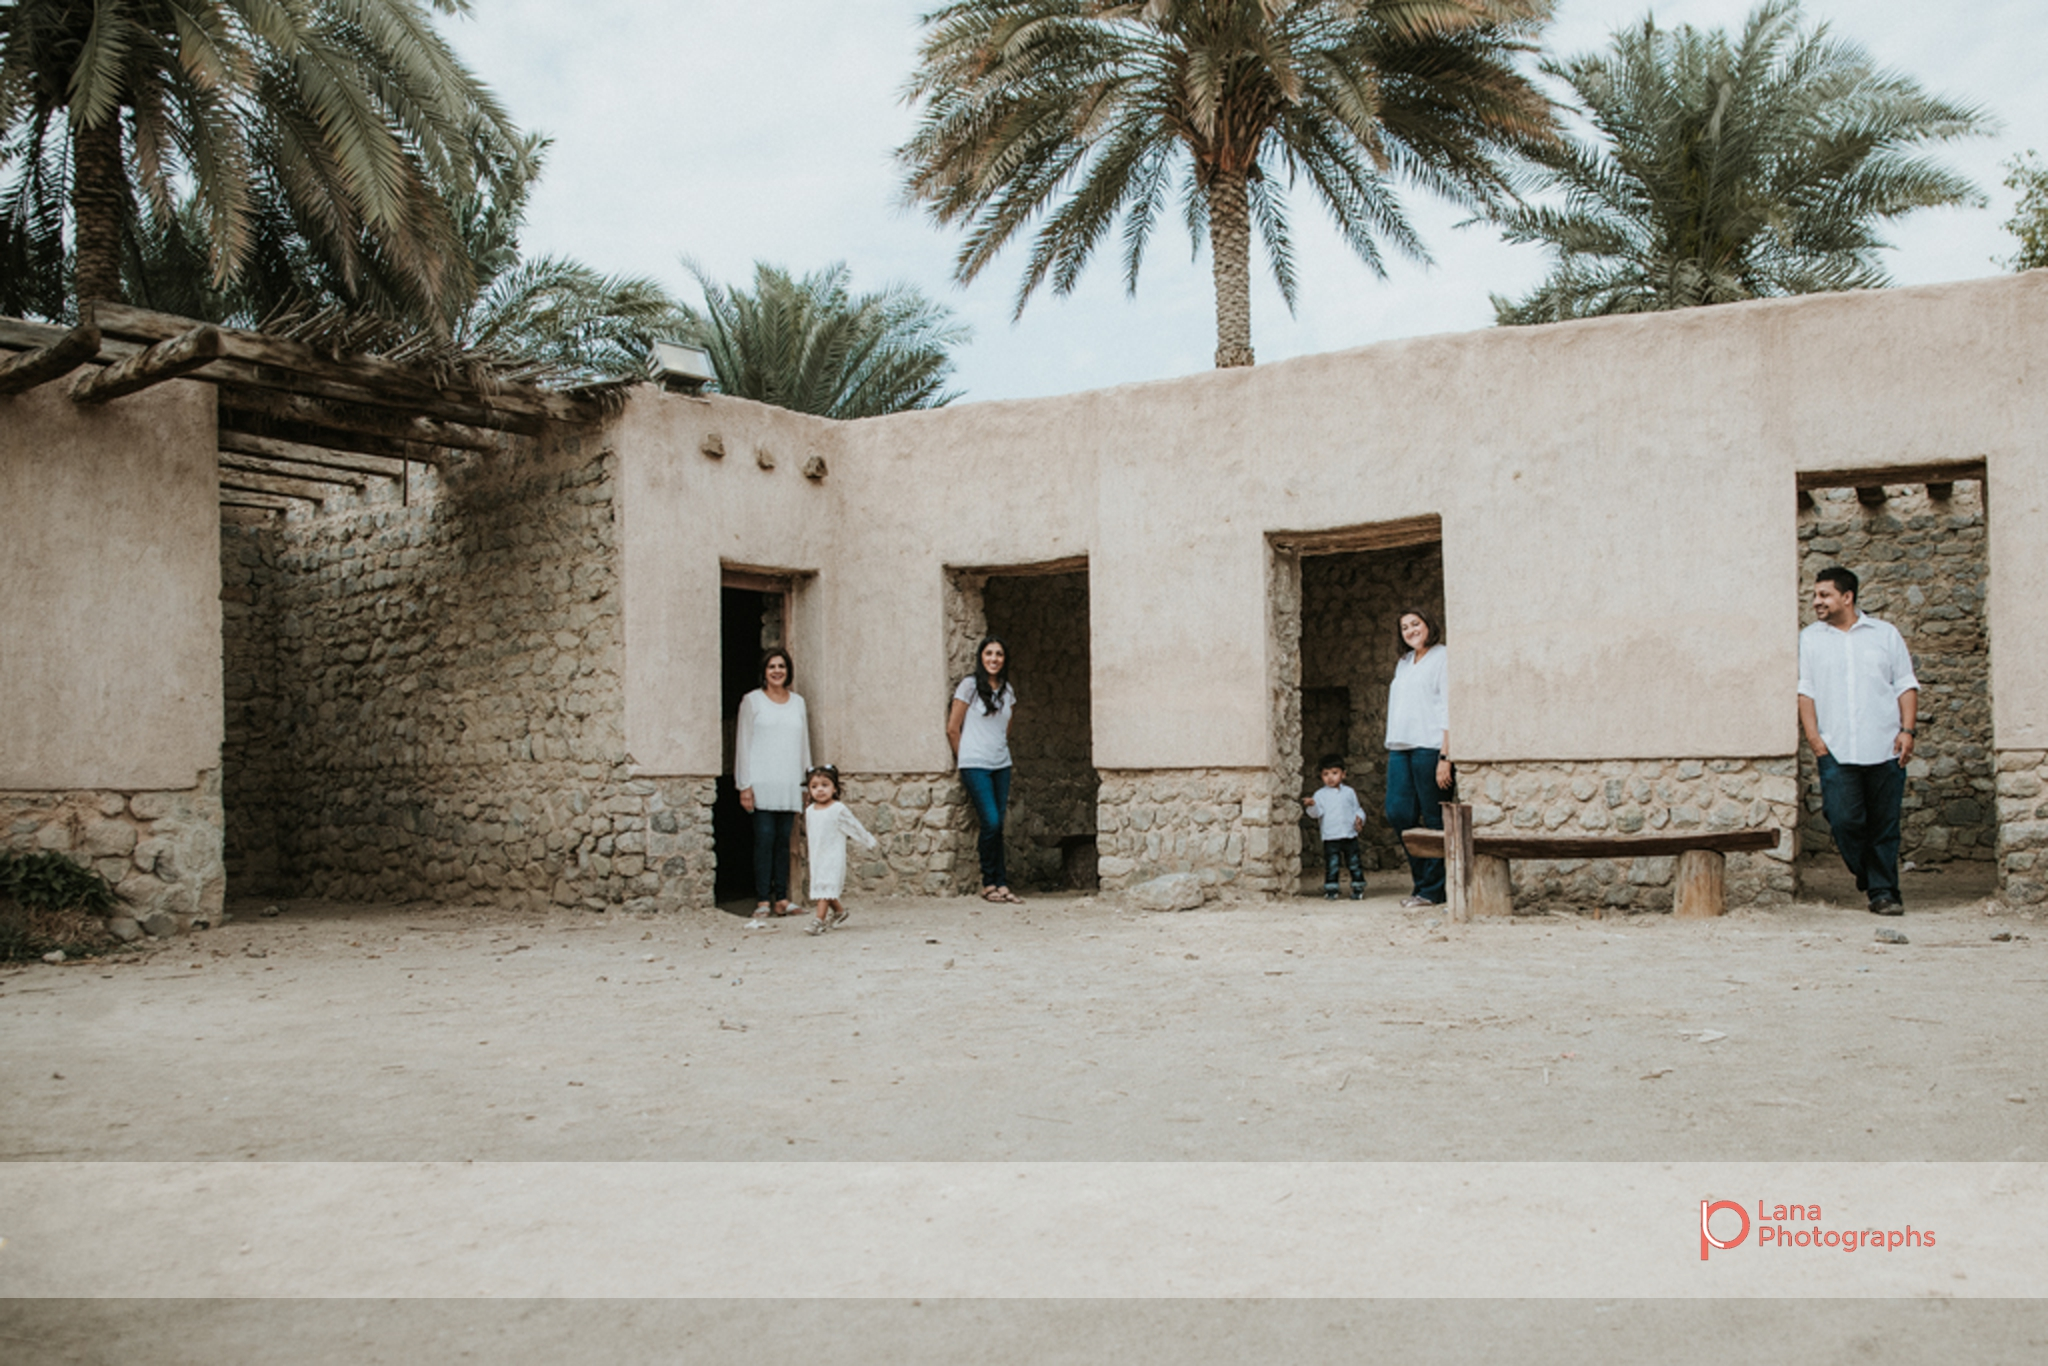 Lana Photographs Family Photographer Dubai Top Family Photographers family of four posing inside door frames under palm trees